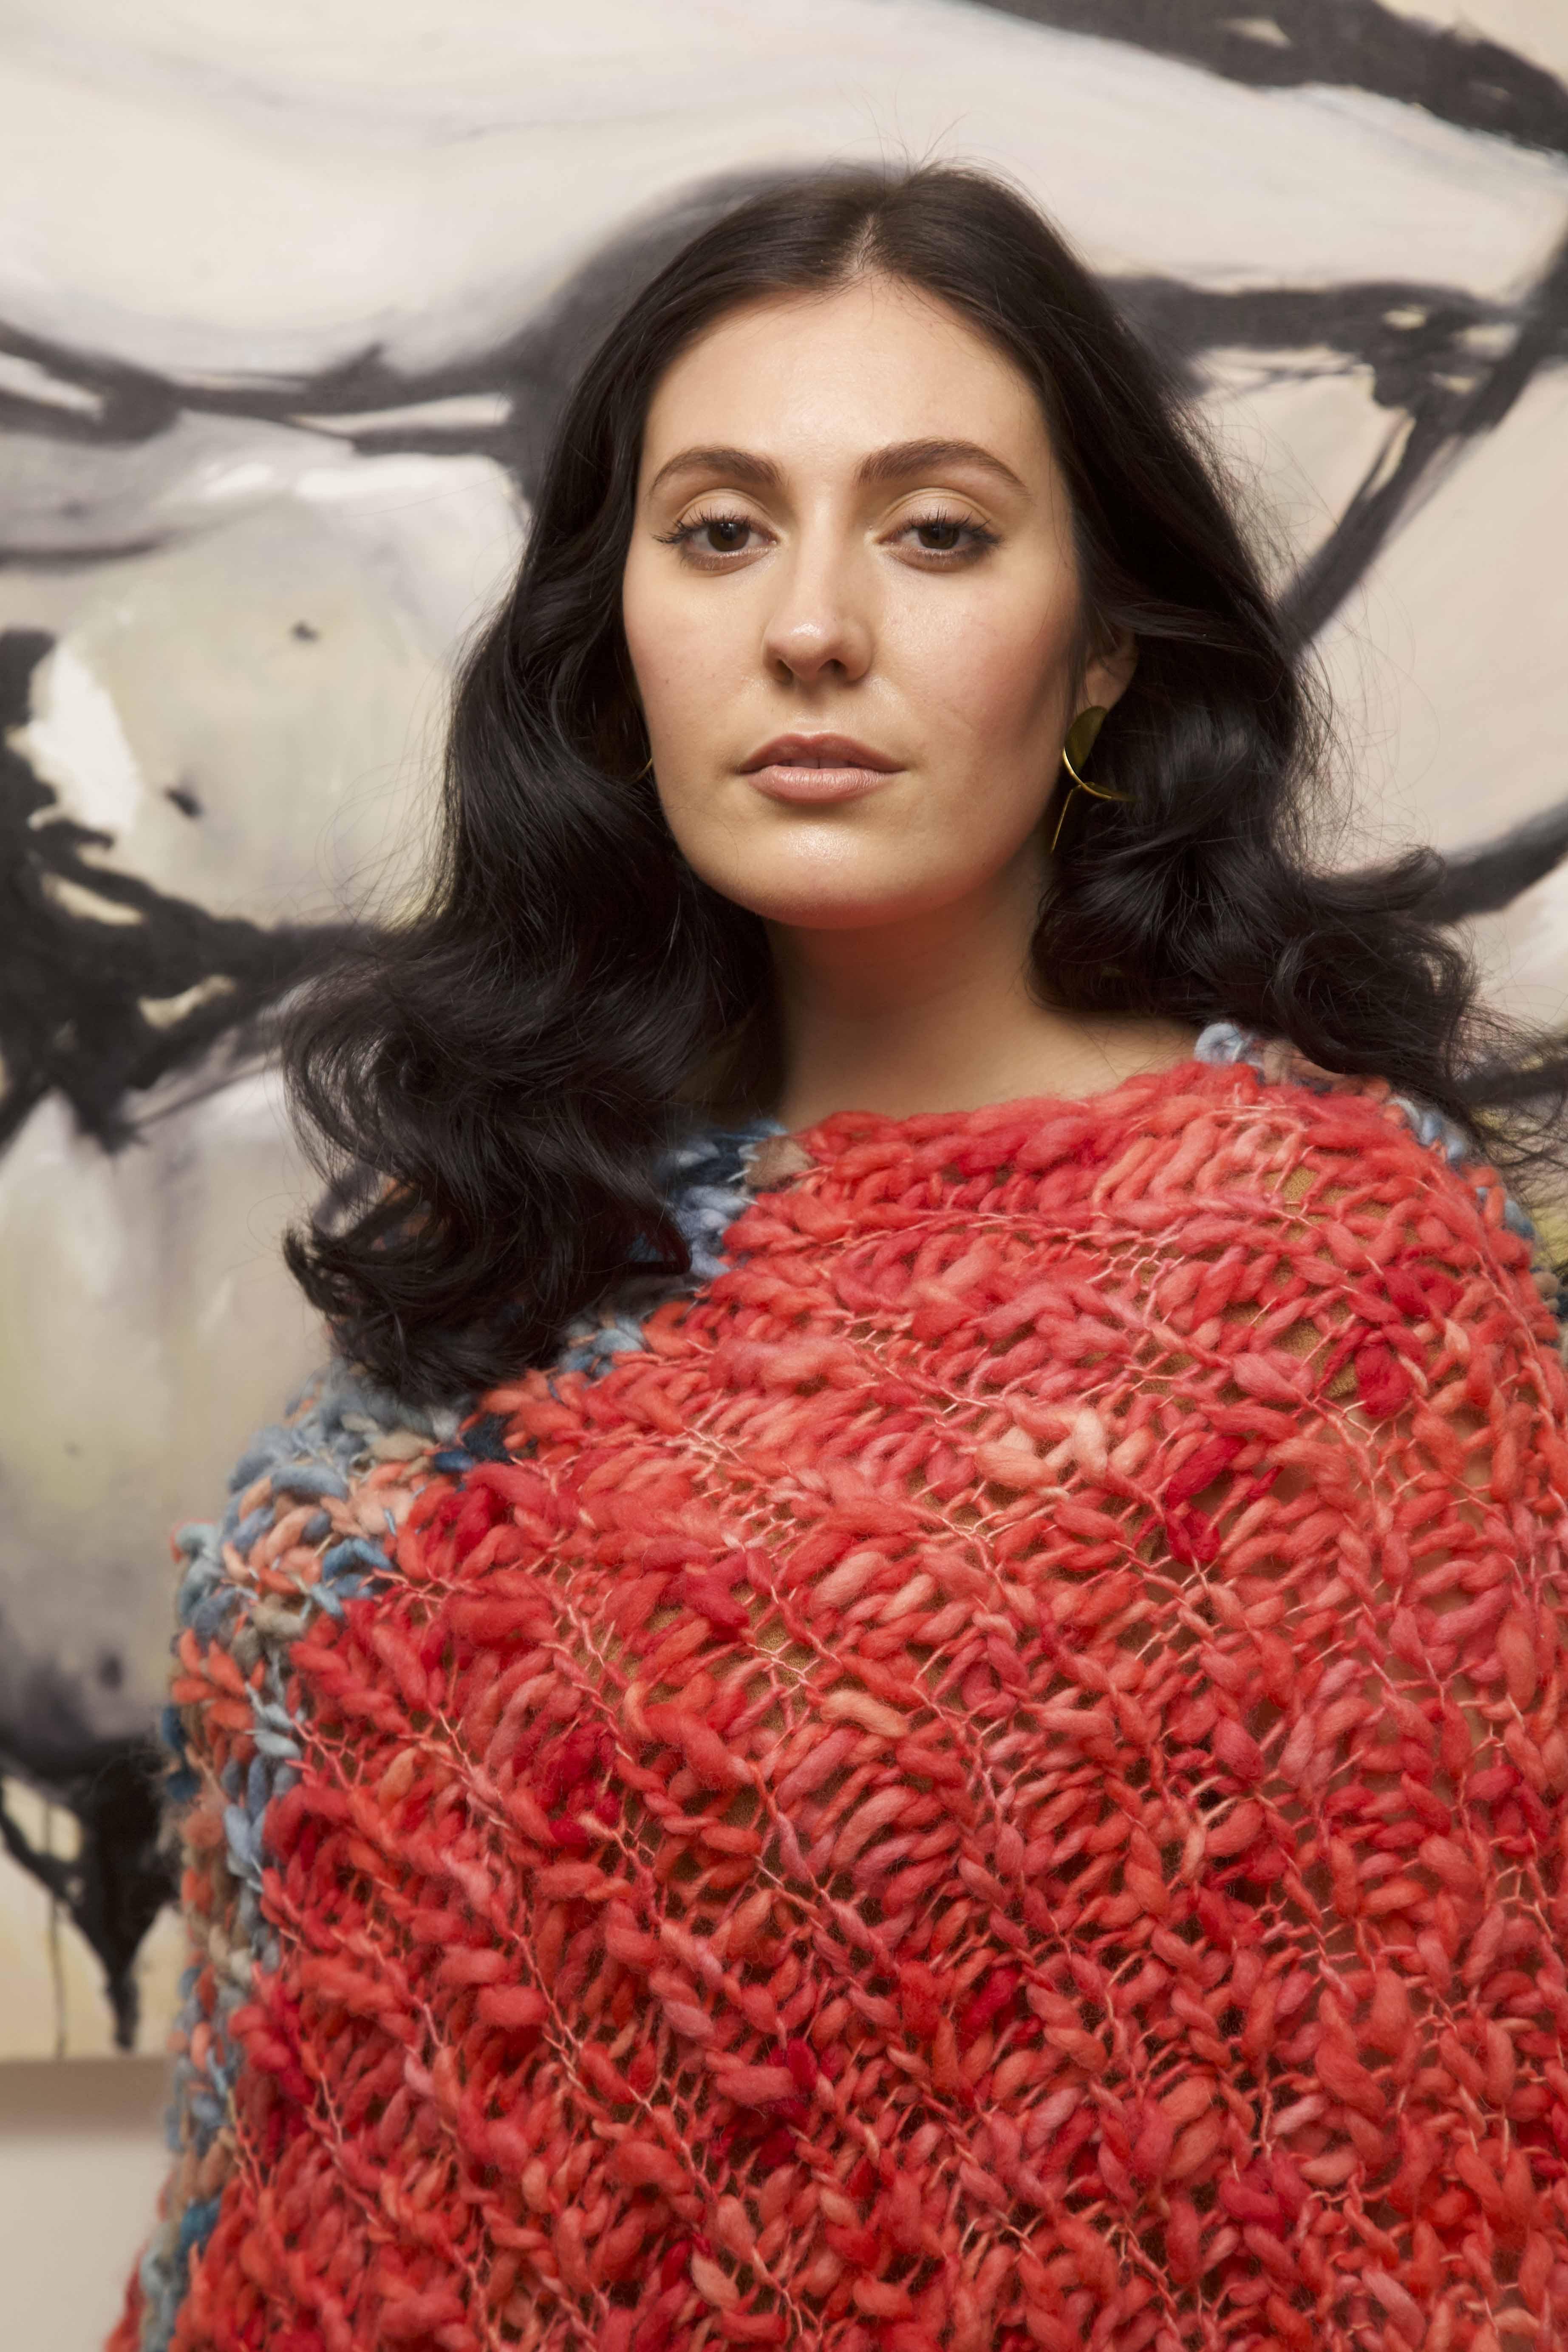 LISA AVIVA-A_W 19_20 Blanket Poncho in Coral